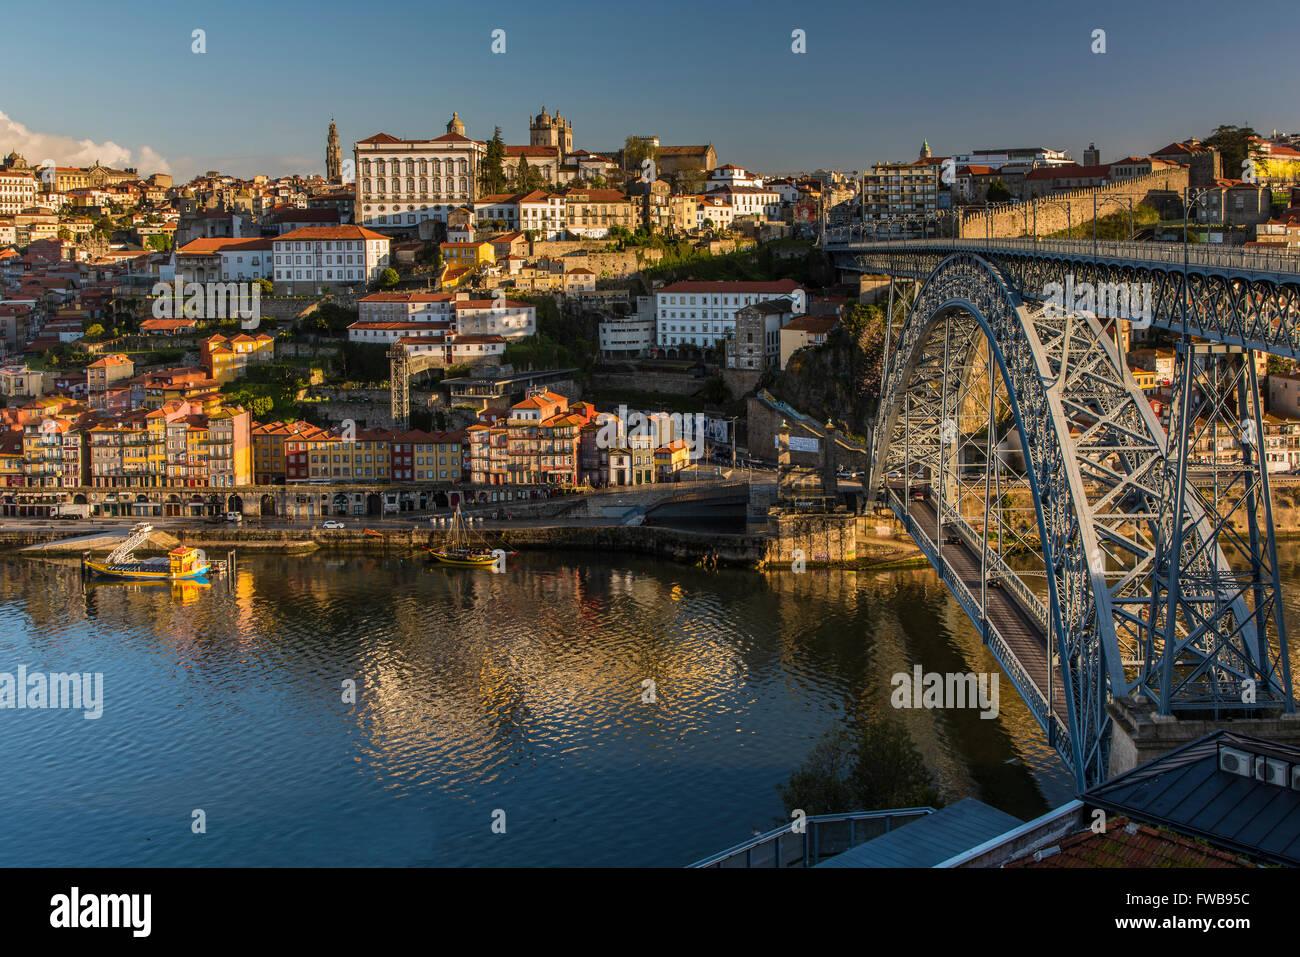 City skyline with Douro river and Dom Luis I bridge, Porto, Portugal - Stock Image